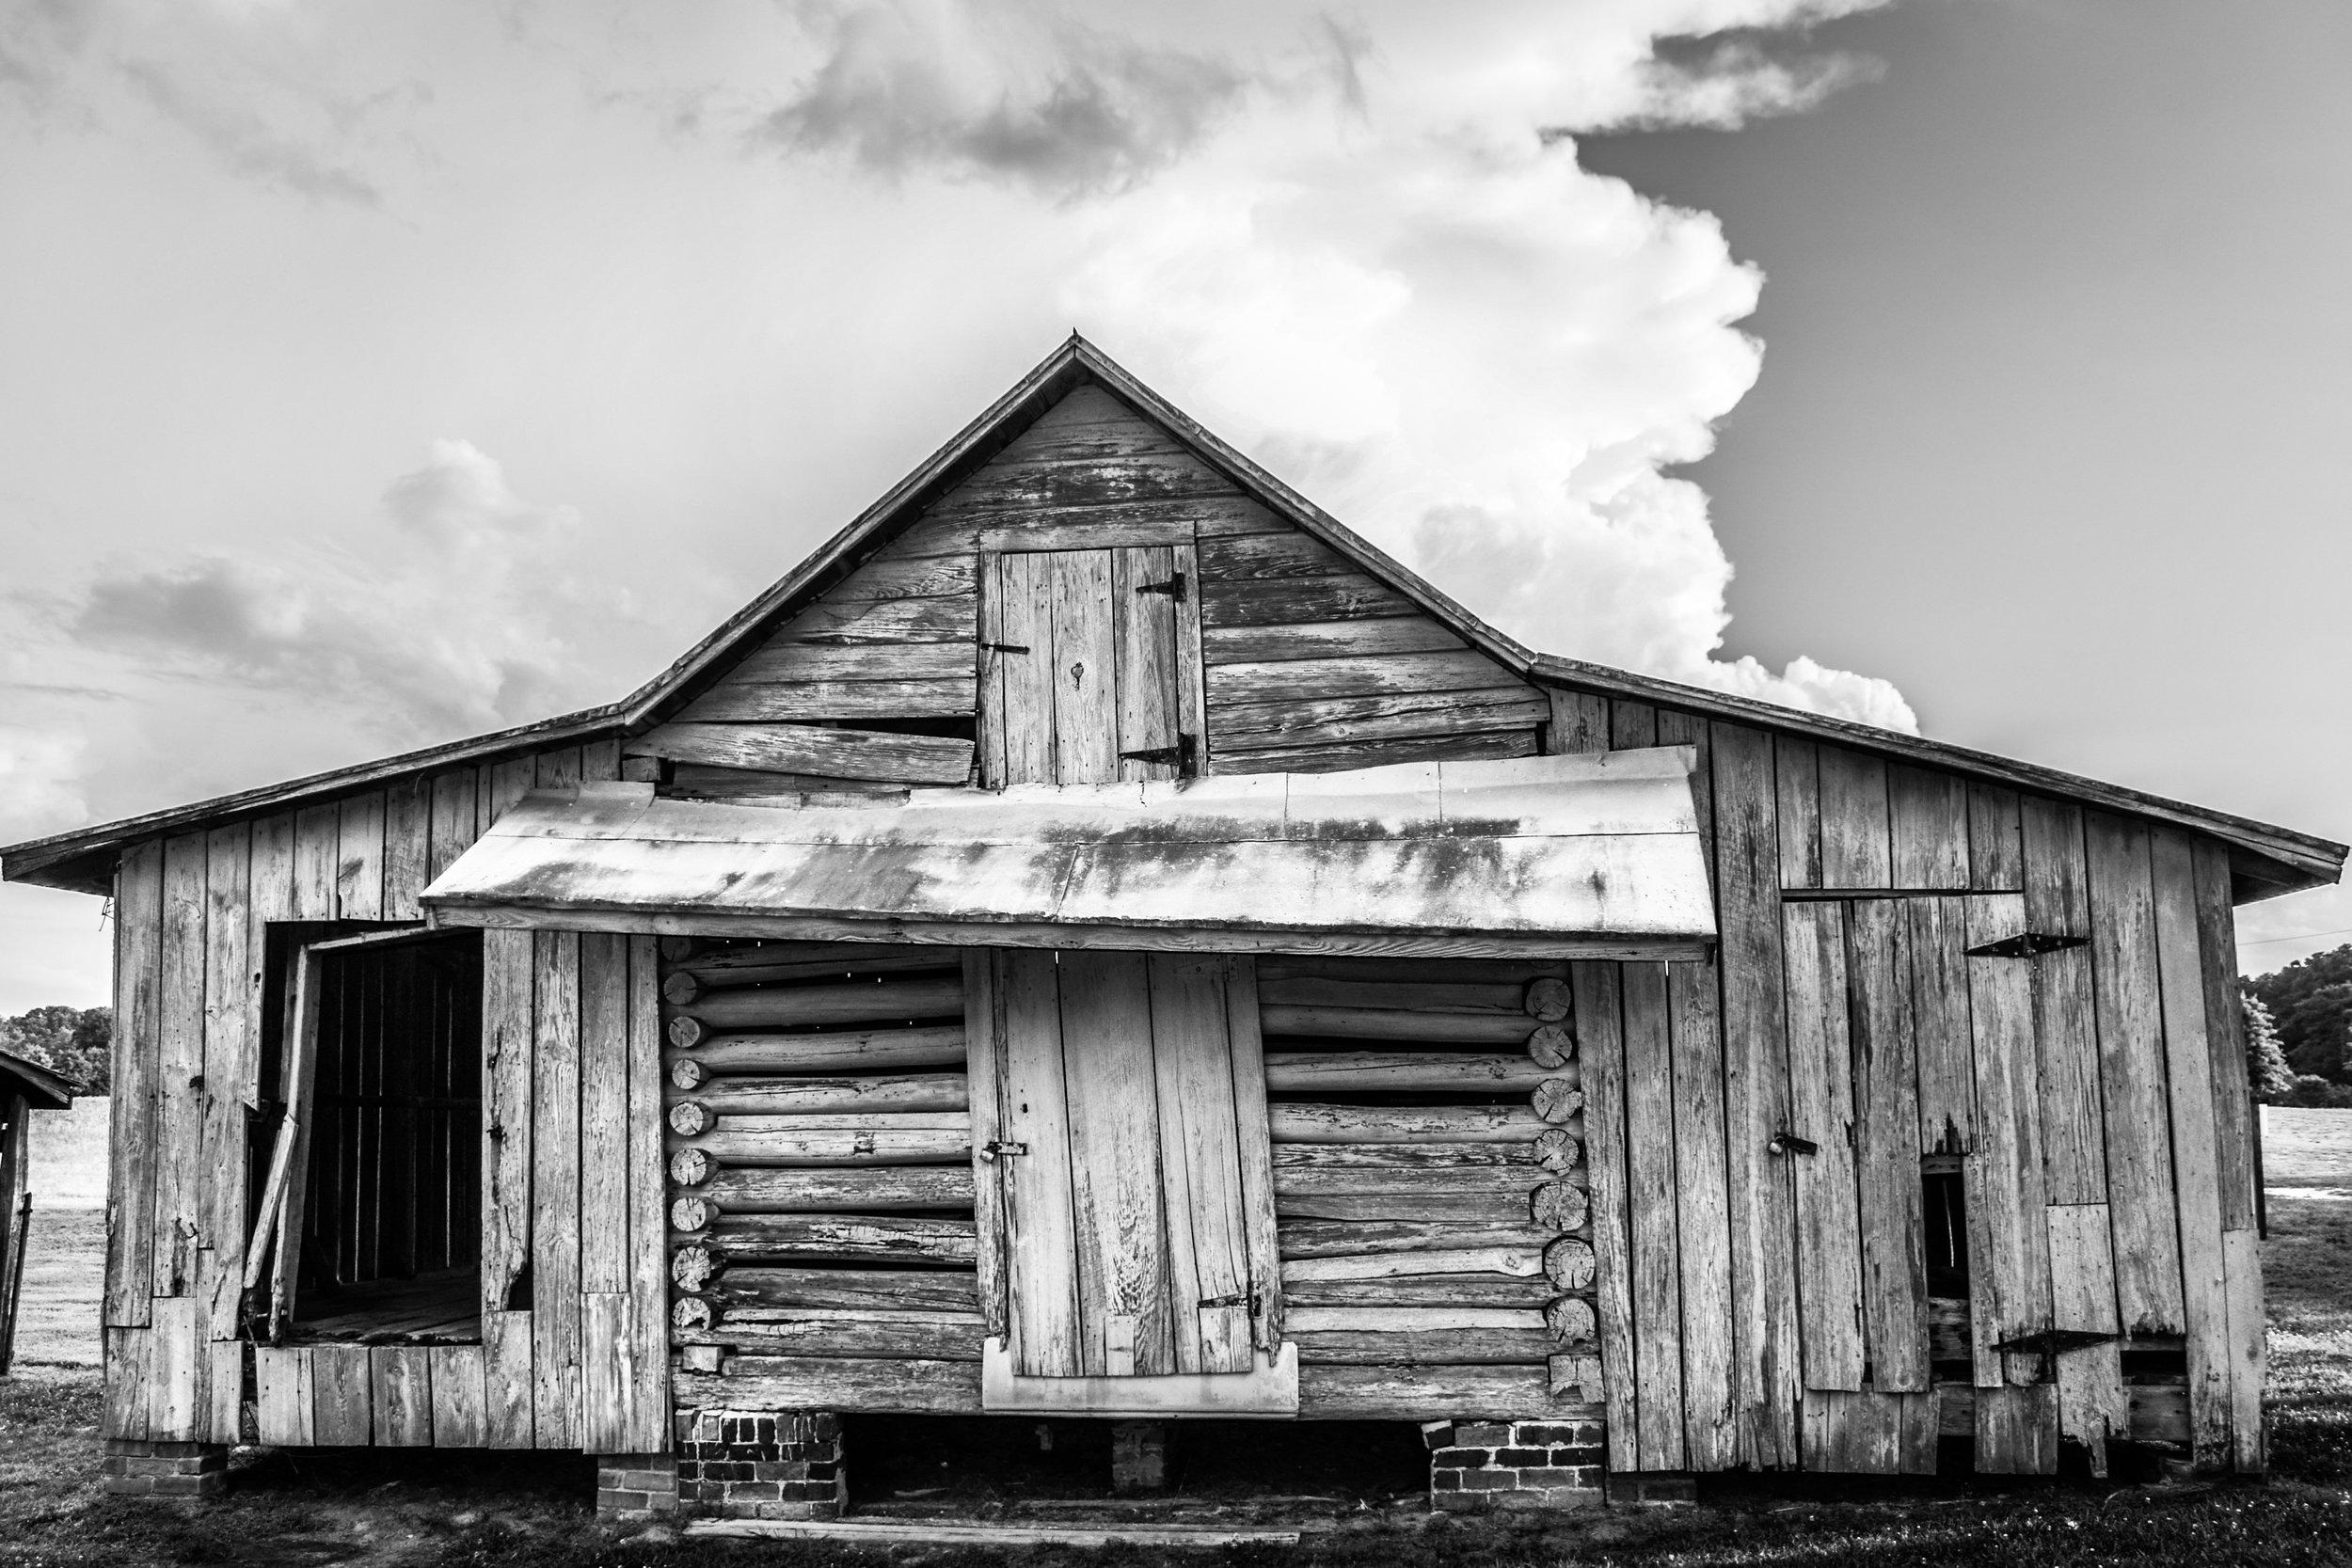 barn-black an white-Isle of Wight County-Smithfield-Windsor Castle park-Virginia.JPG